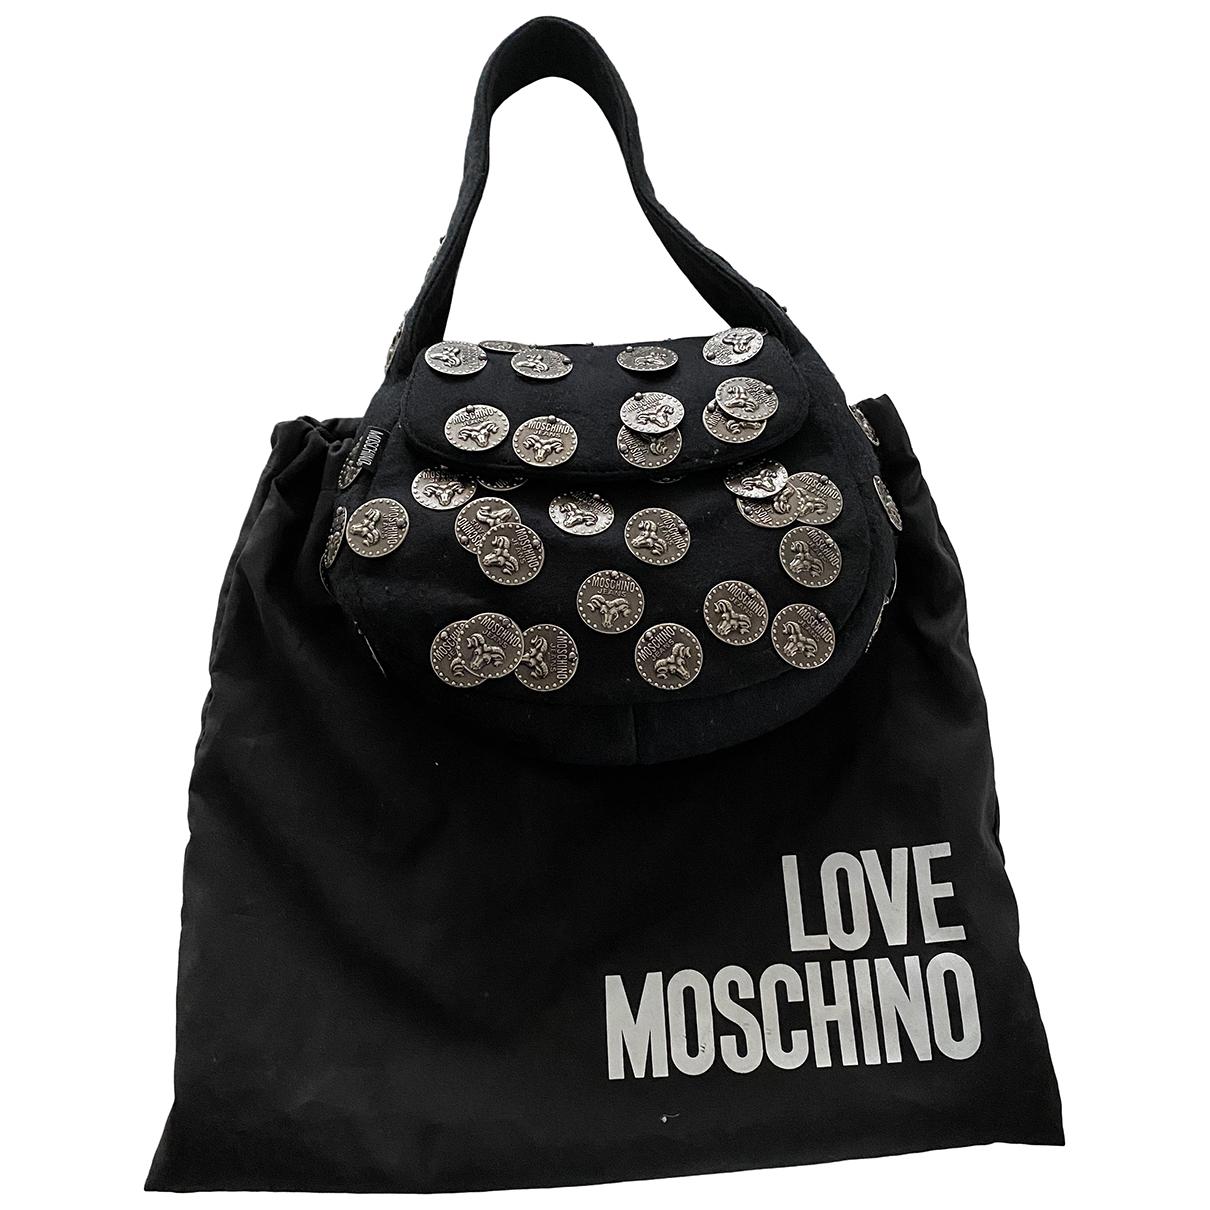 Moschino \N Black Wool handbag for Women \N